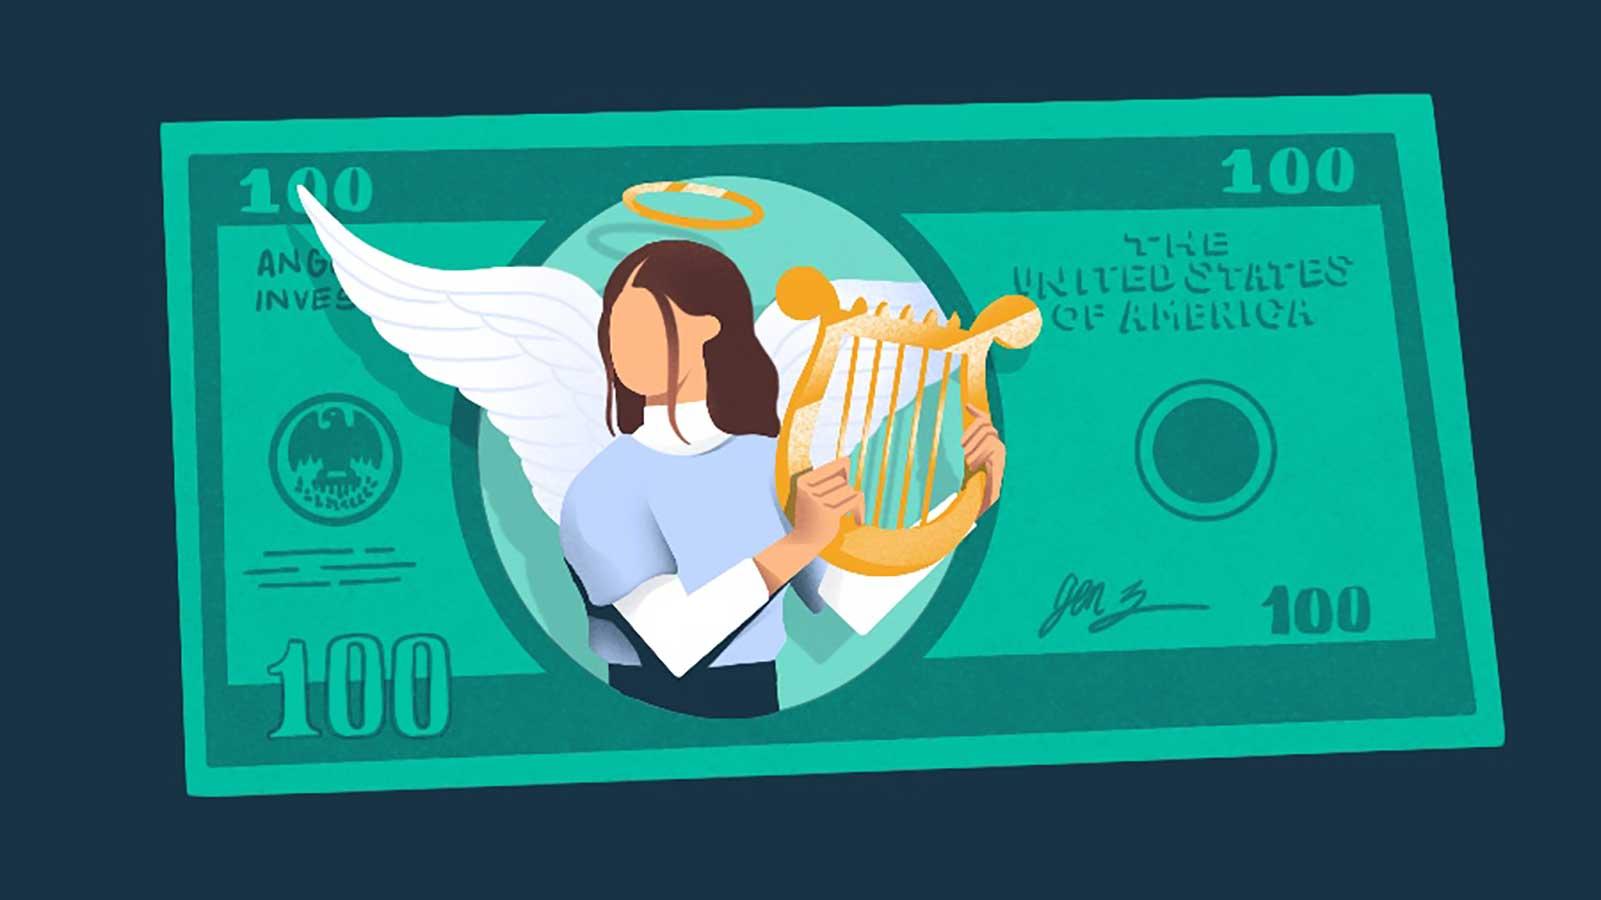 Angel_Investors